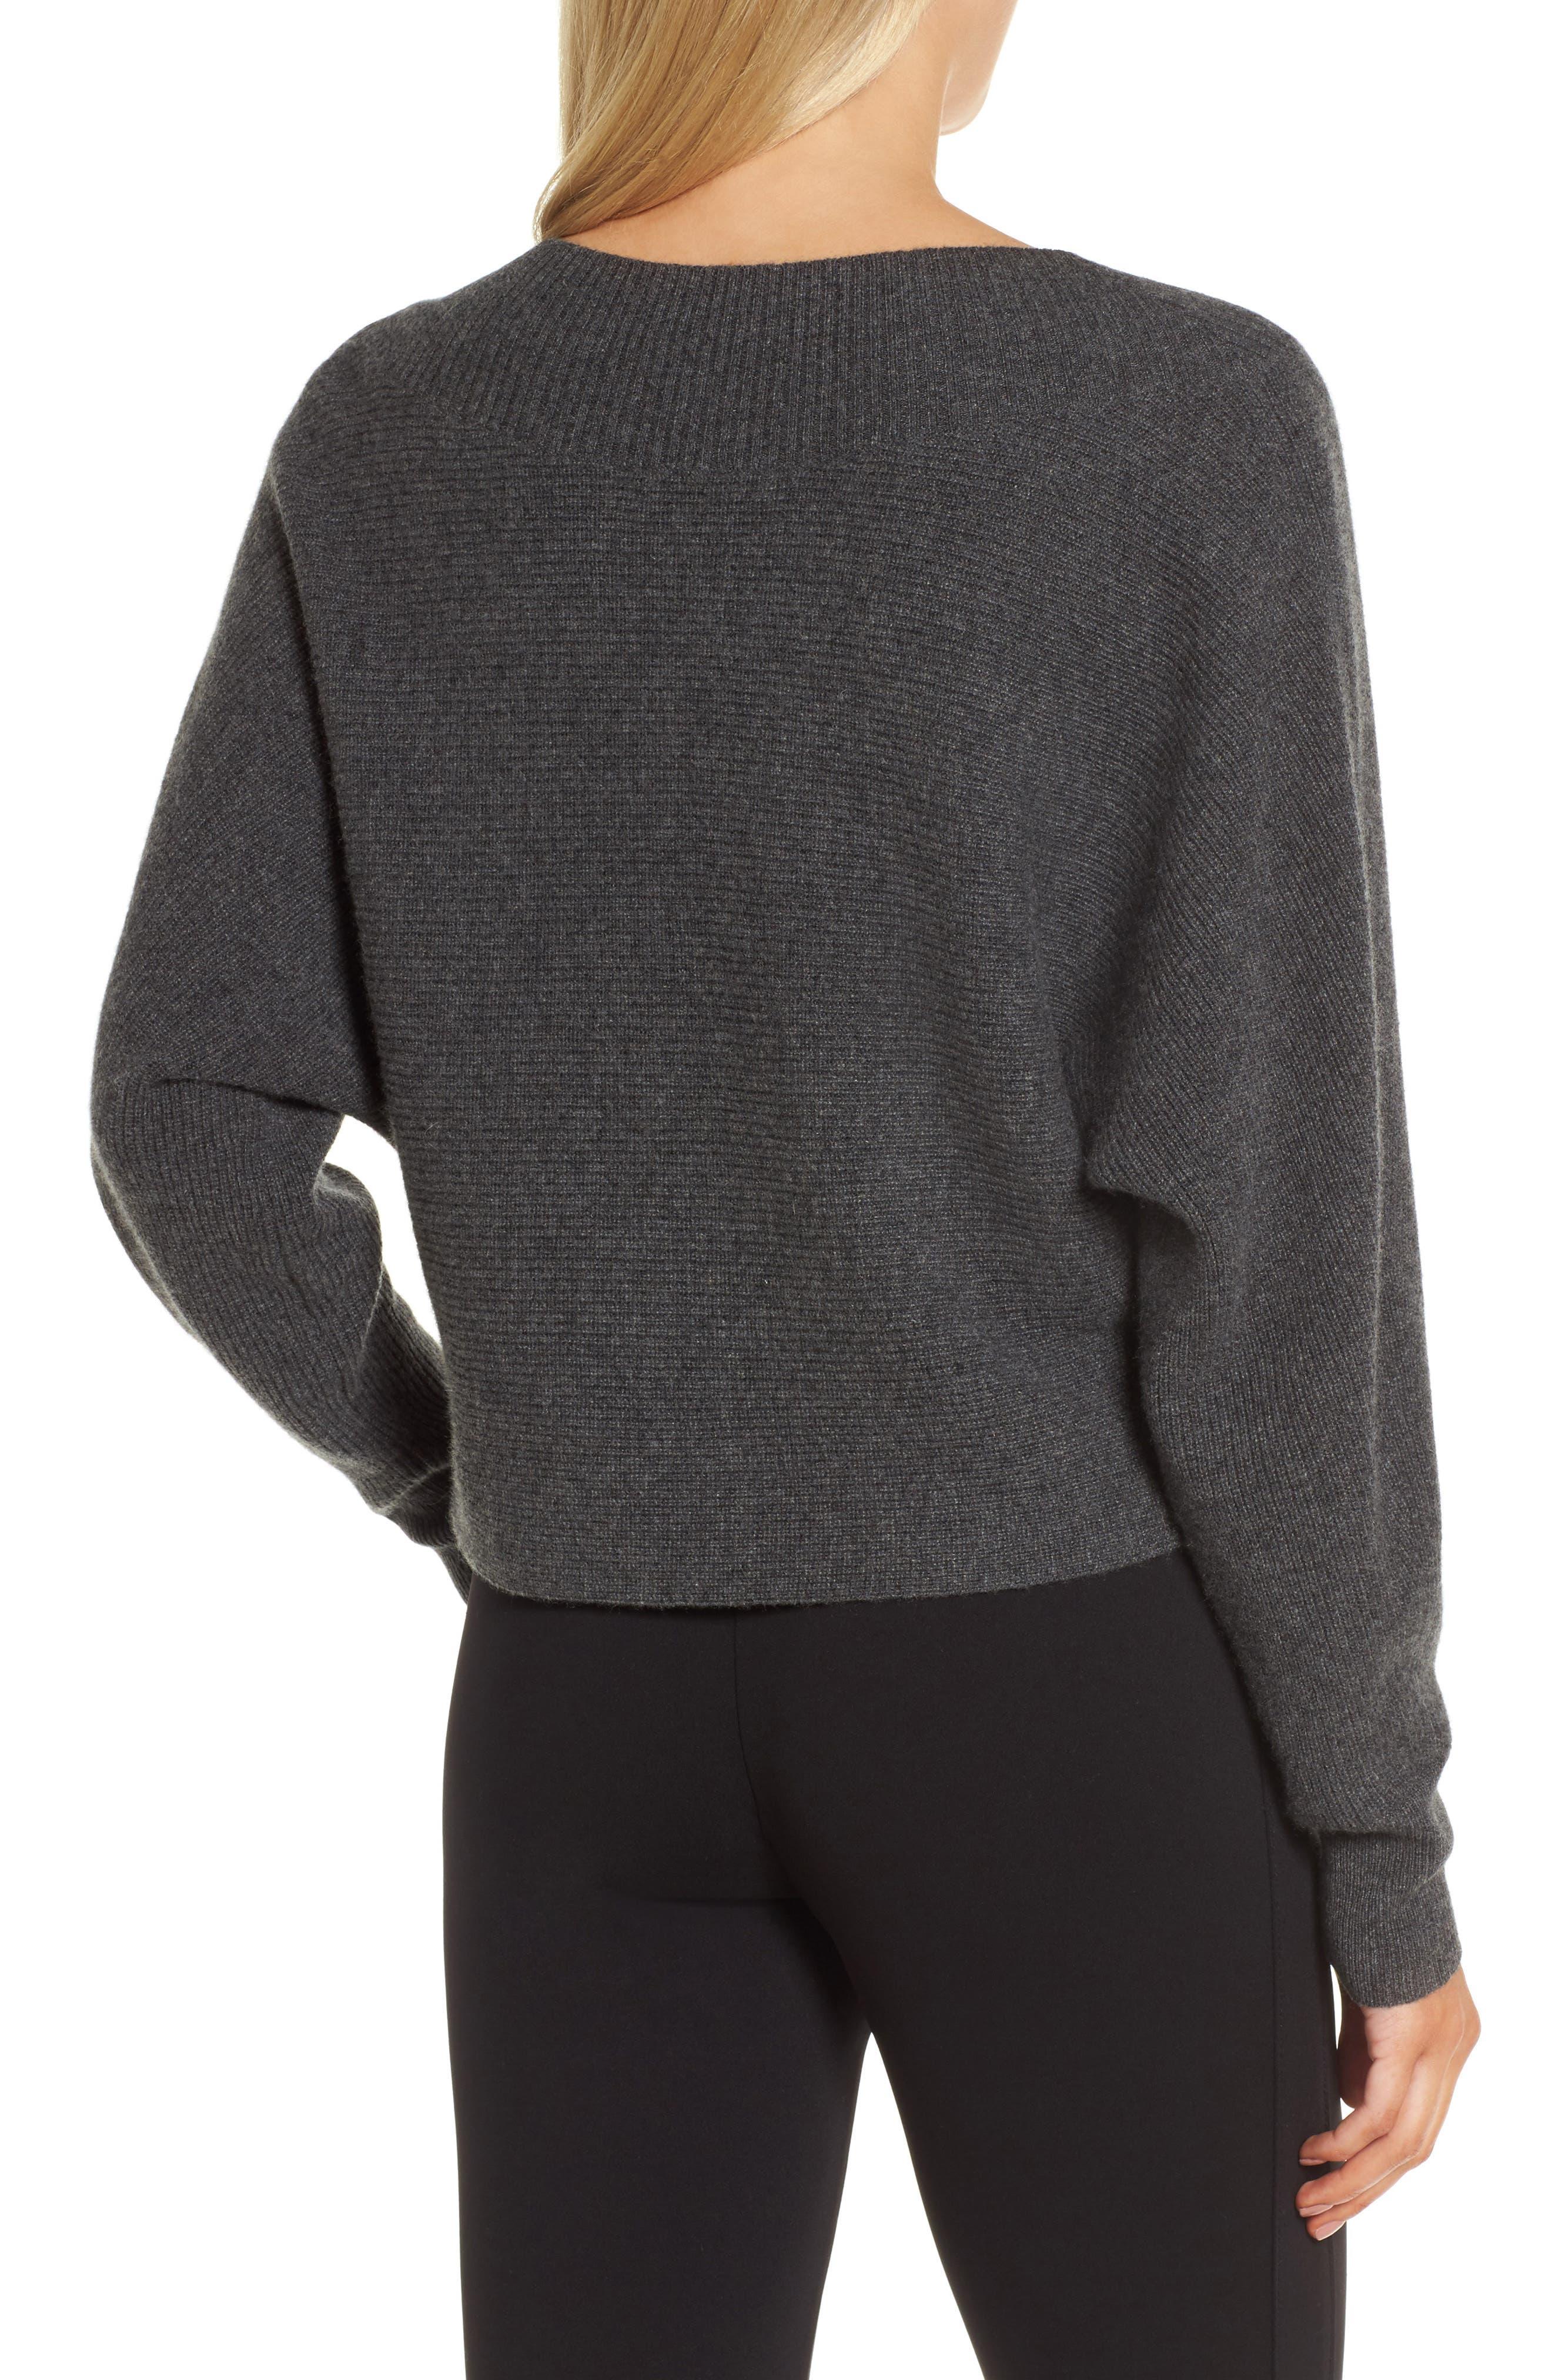 Dolman Sleeve Cashmere Sweater,                             Alternate thumbnail 2, color,                             Grey Castlerock Heather